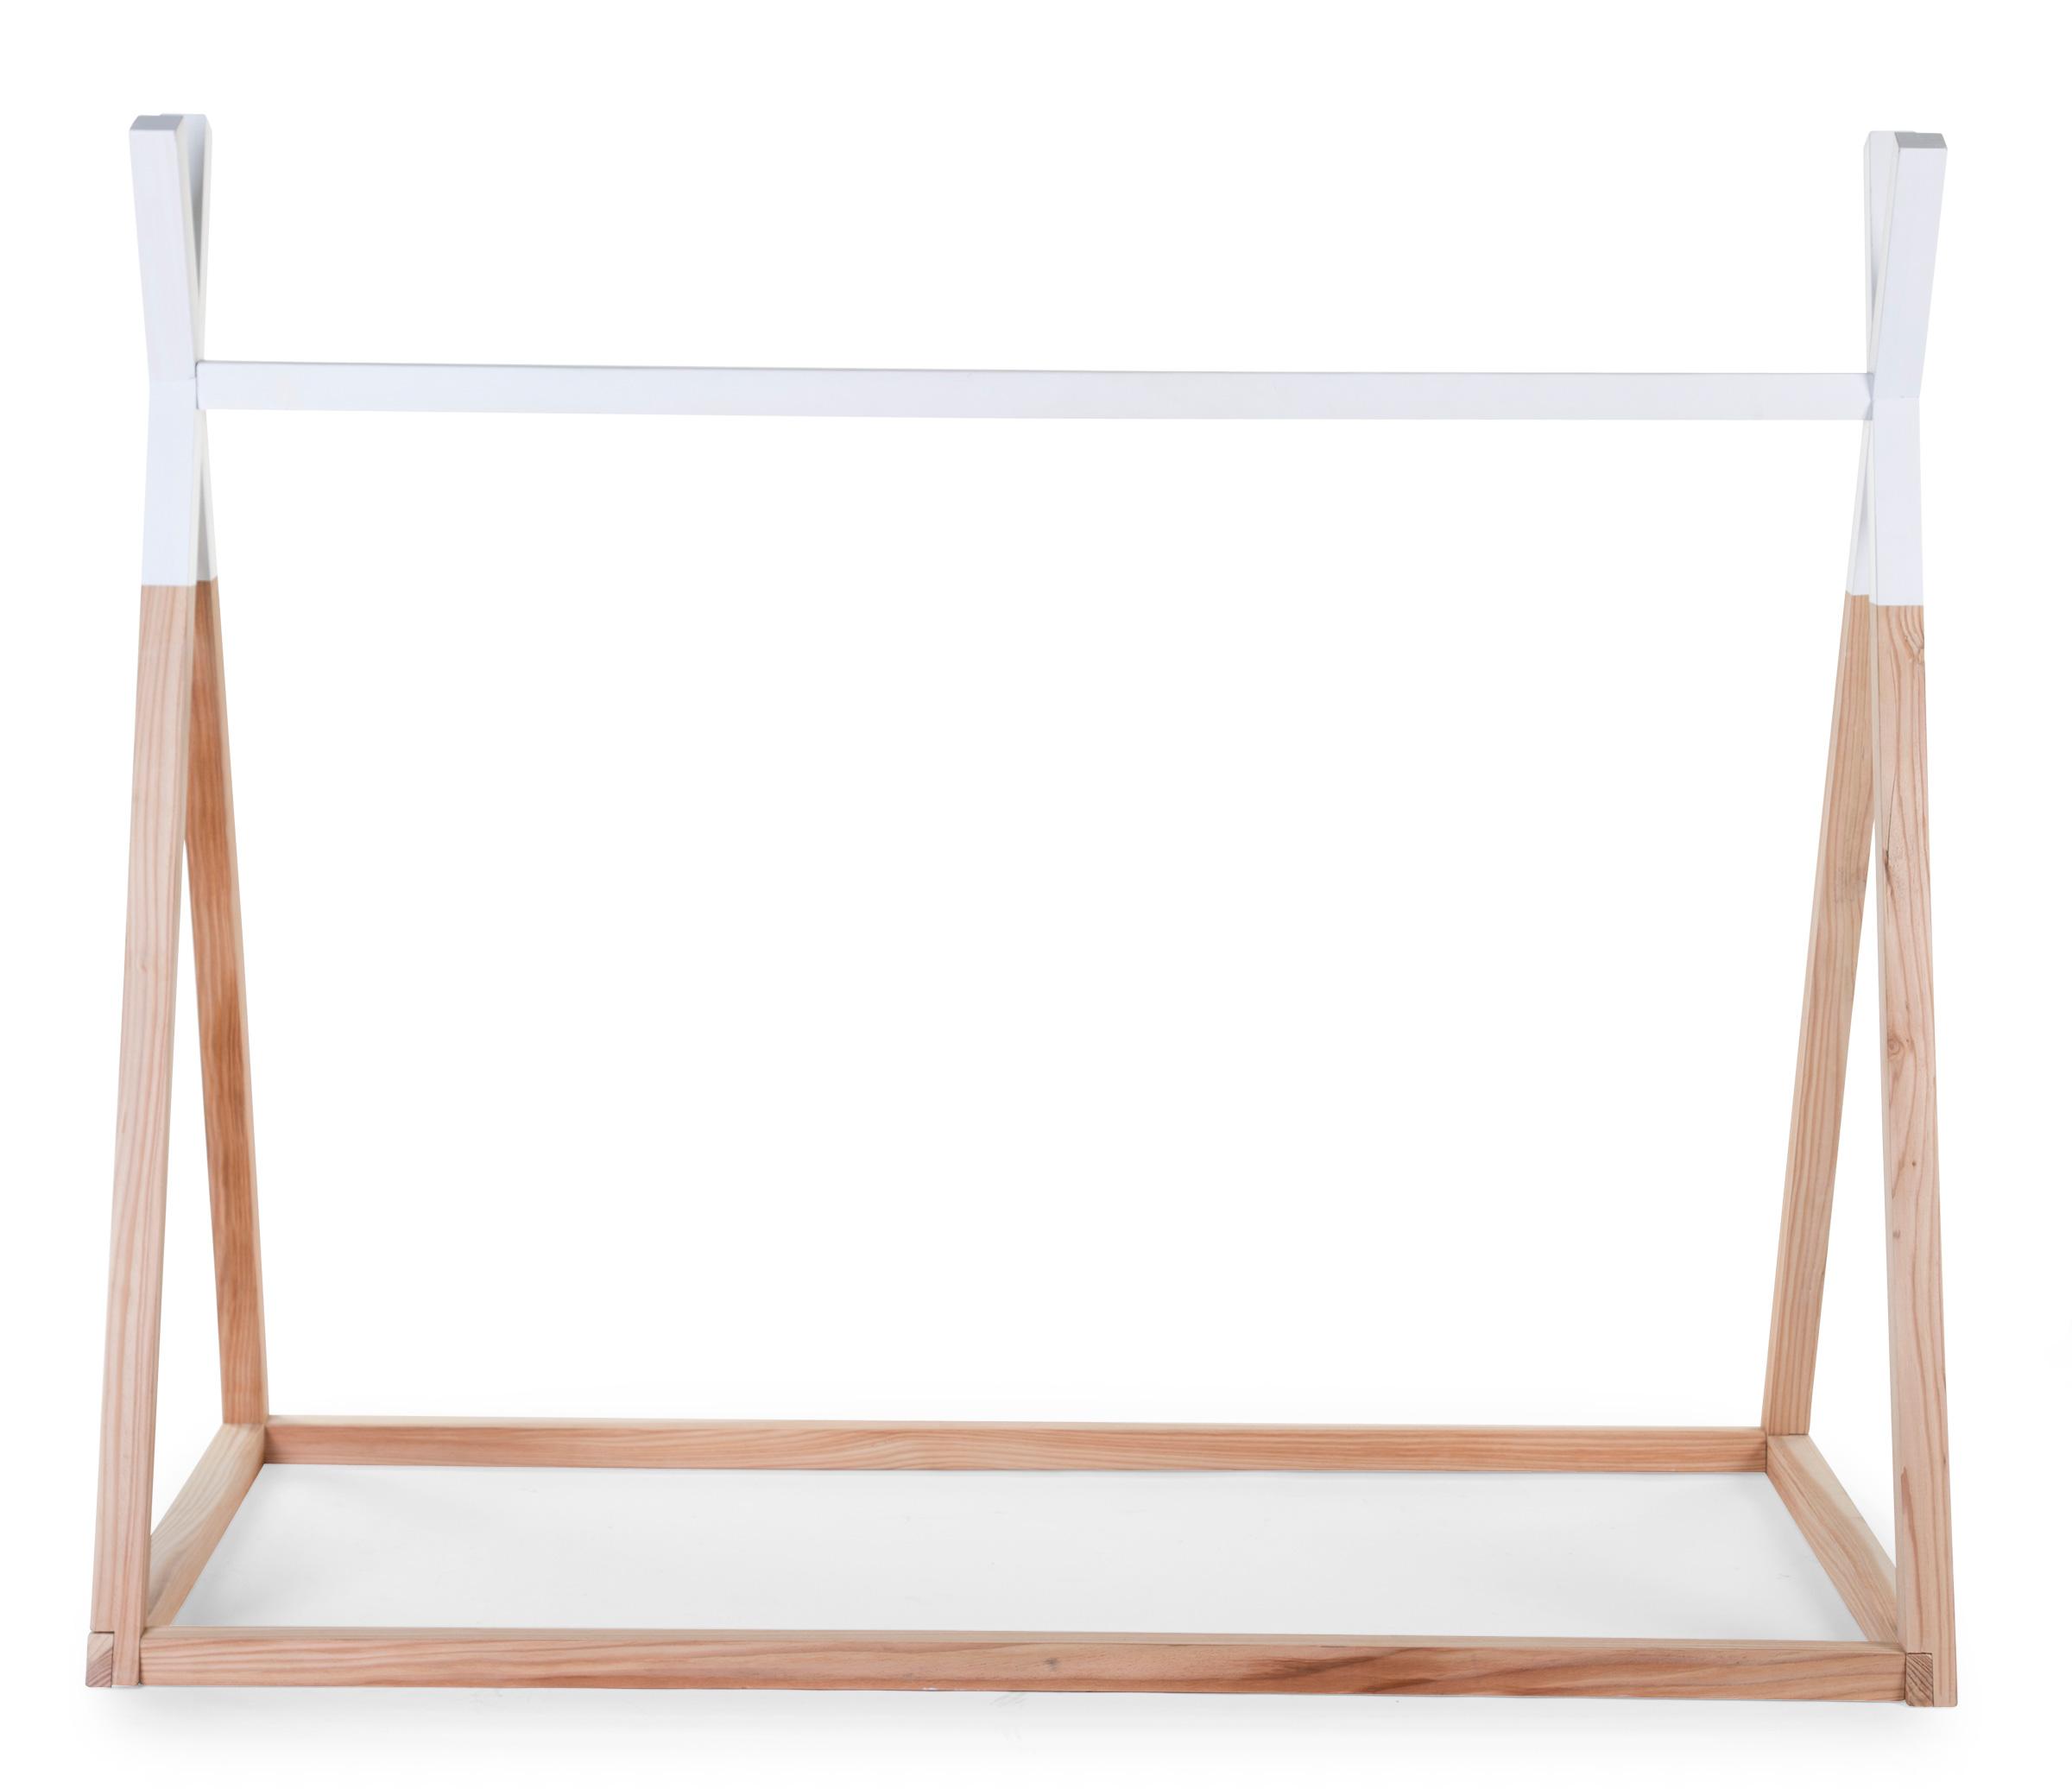 Childhome - Rama do łóżka Tipi 70 x 140 cm - Esy Floresy